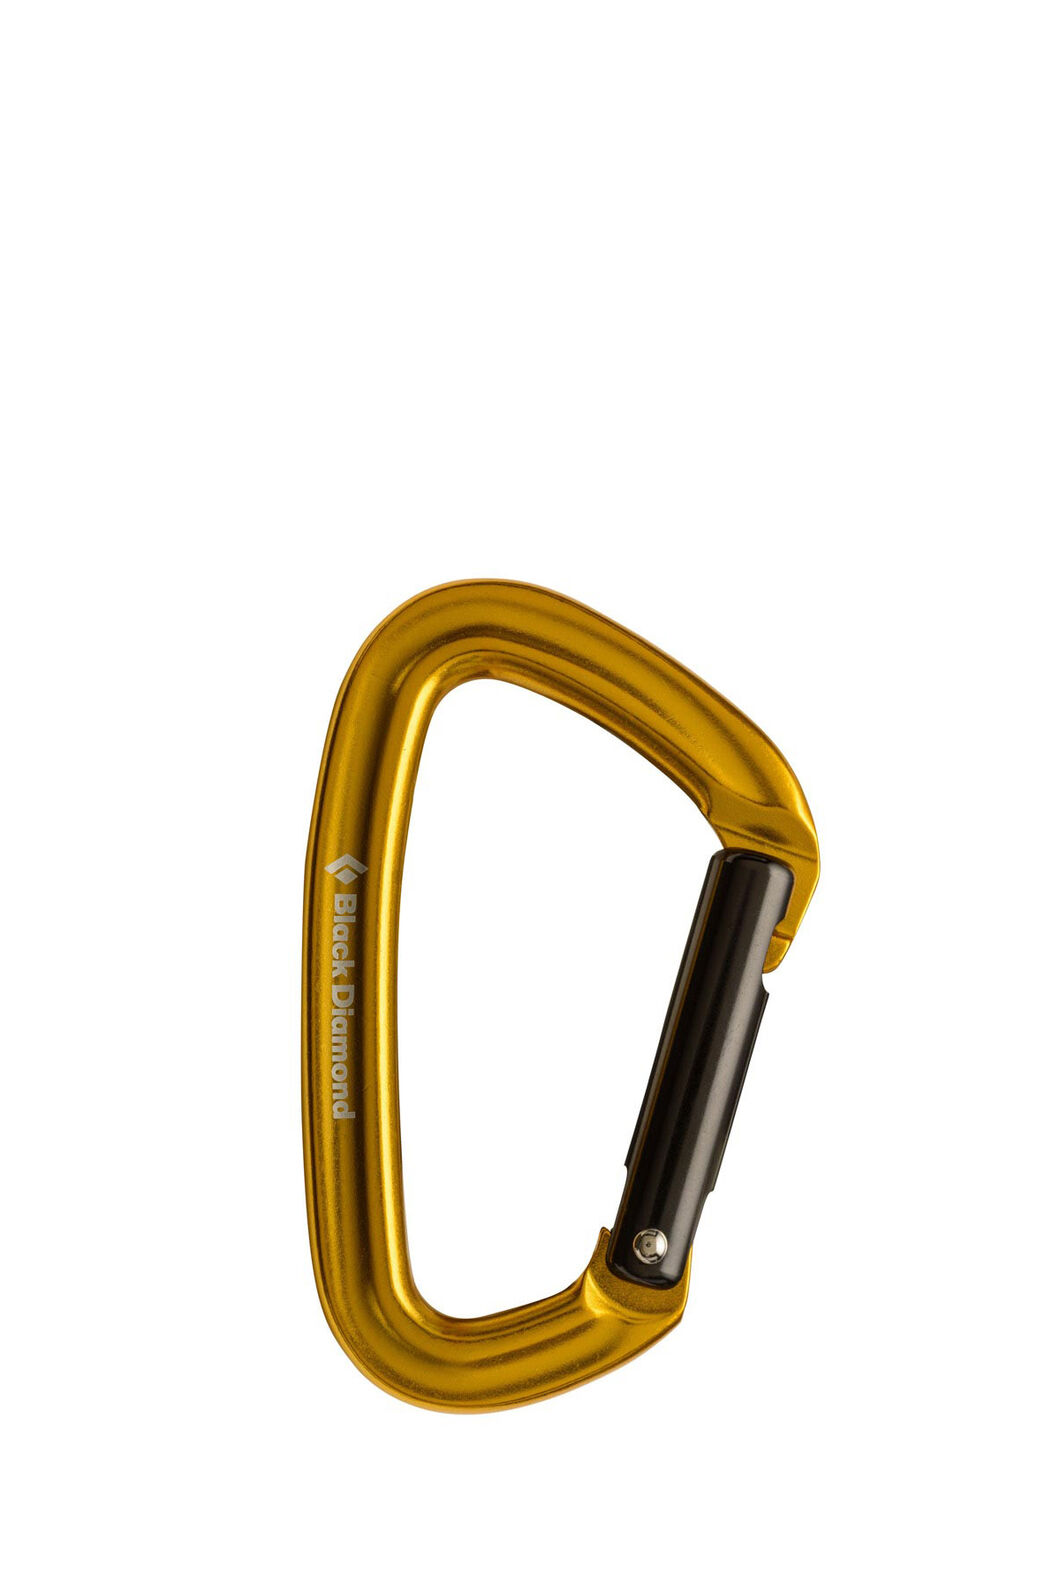 Black Diamond Positron Straight Gate Carabiner, Yellow, hi-res